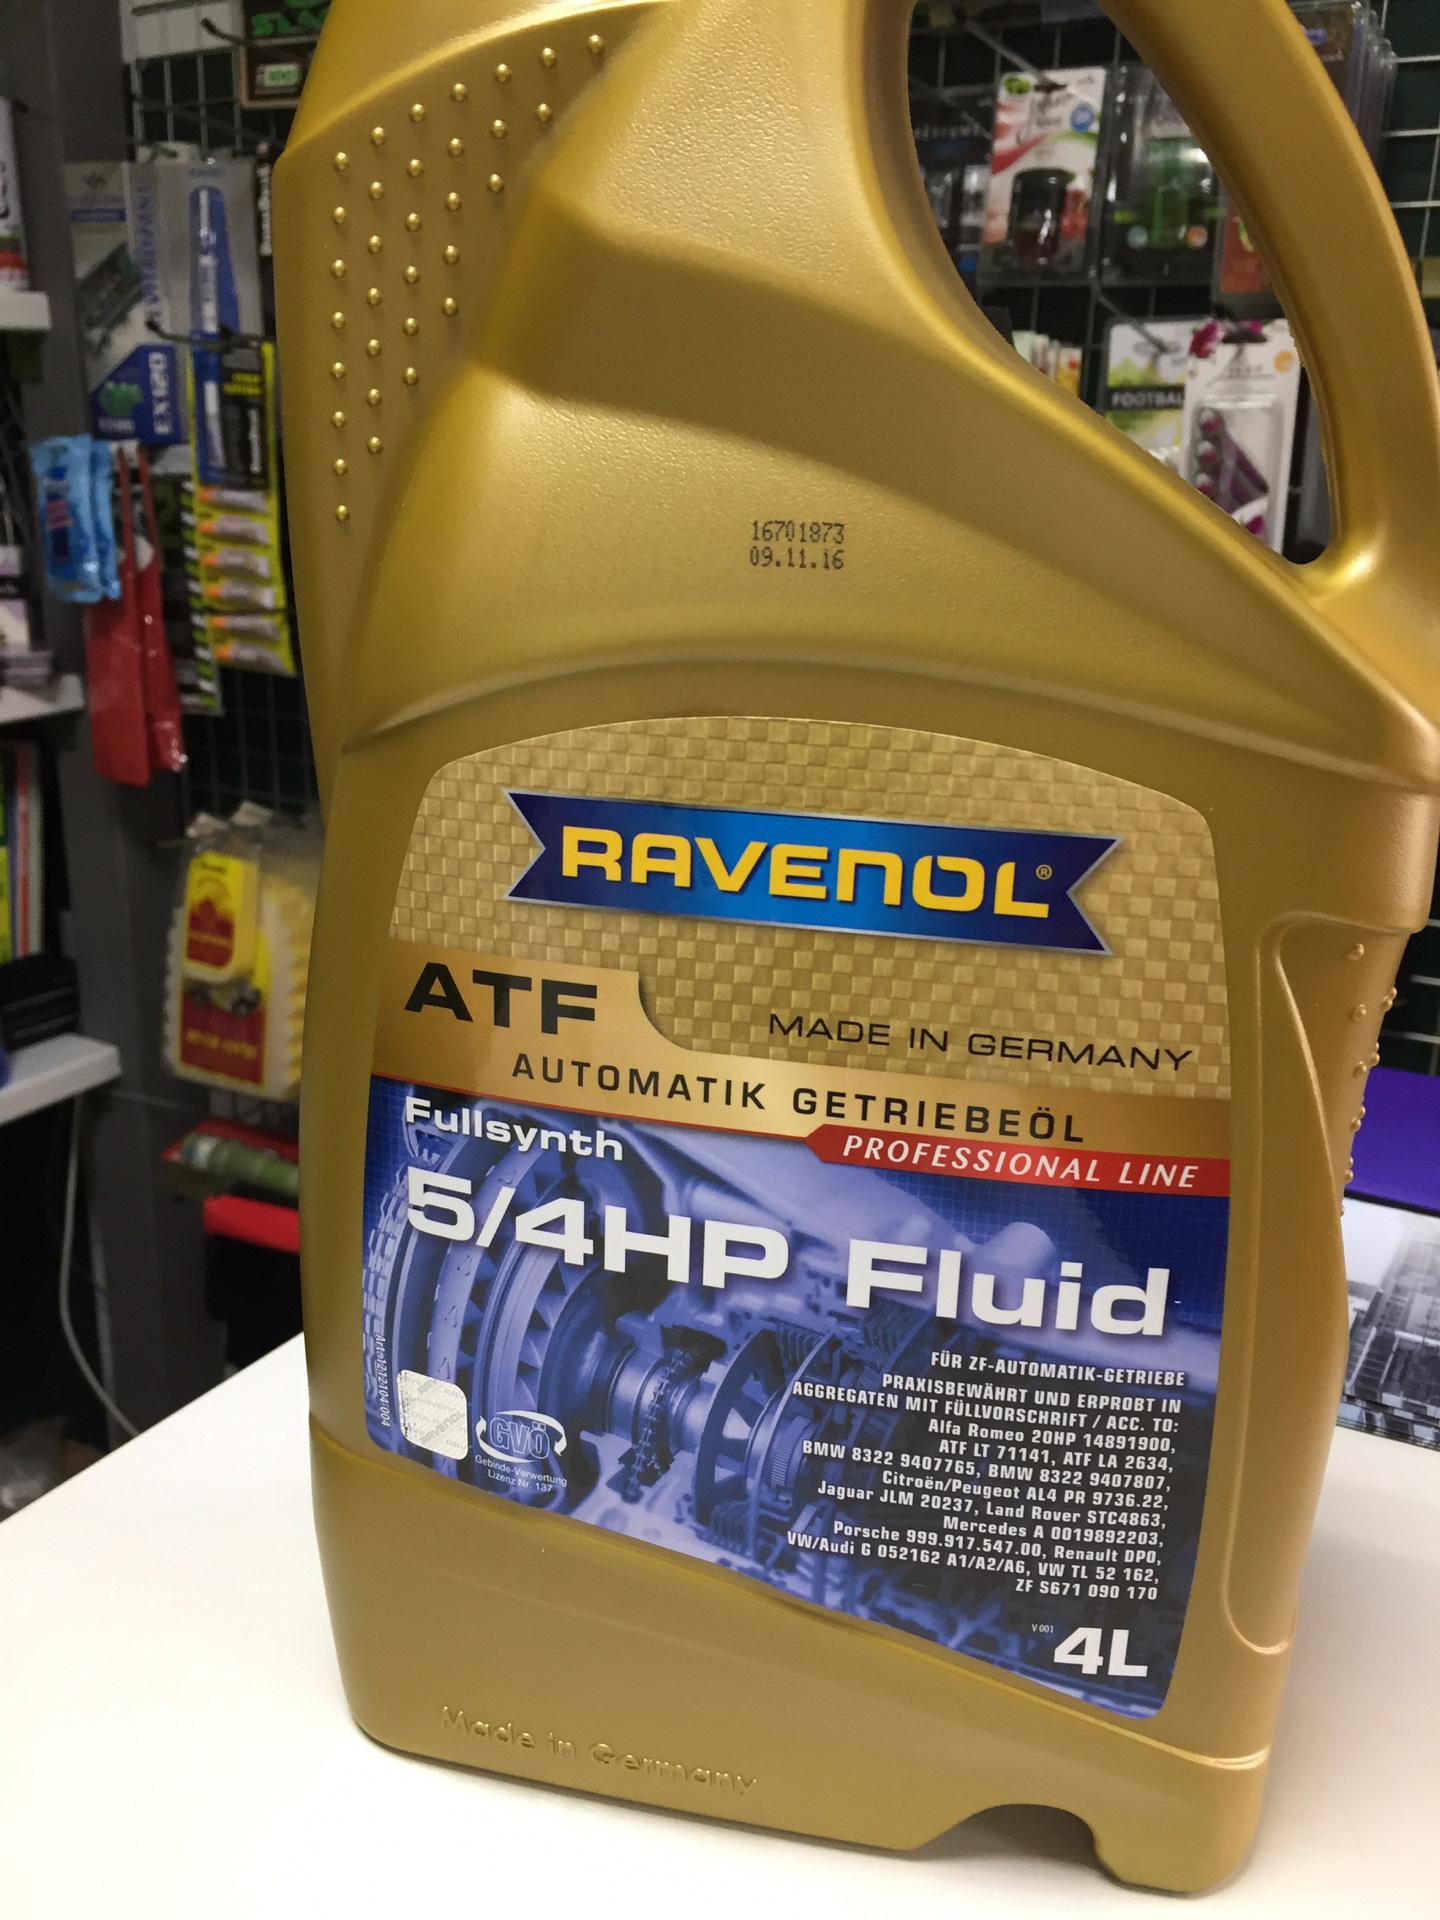 масло равенол заливают в мерседес или нет